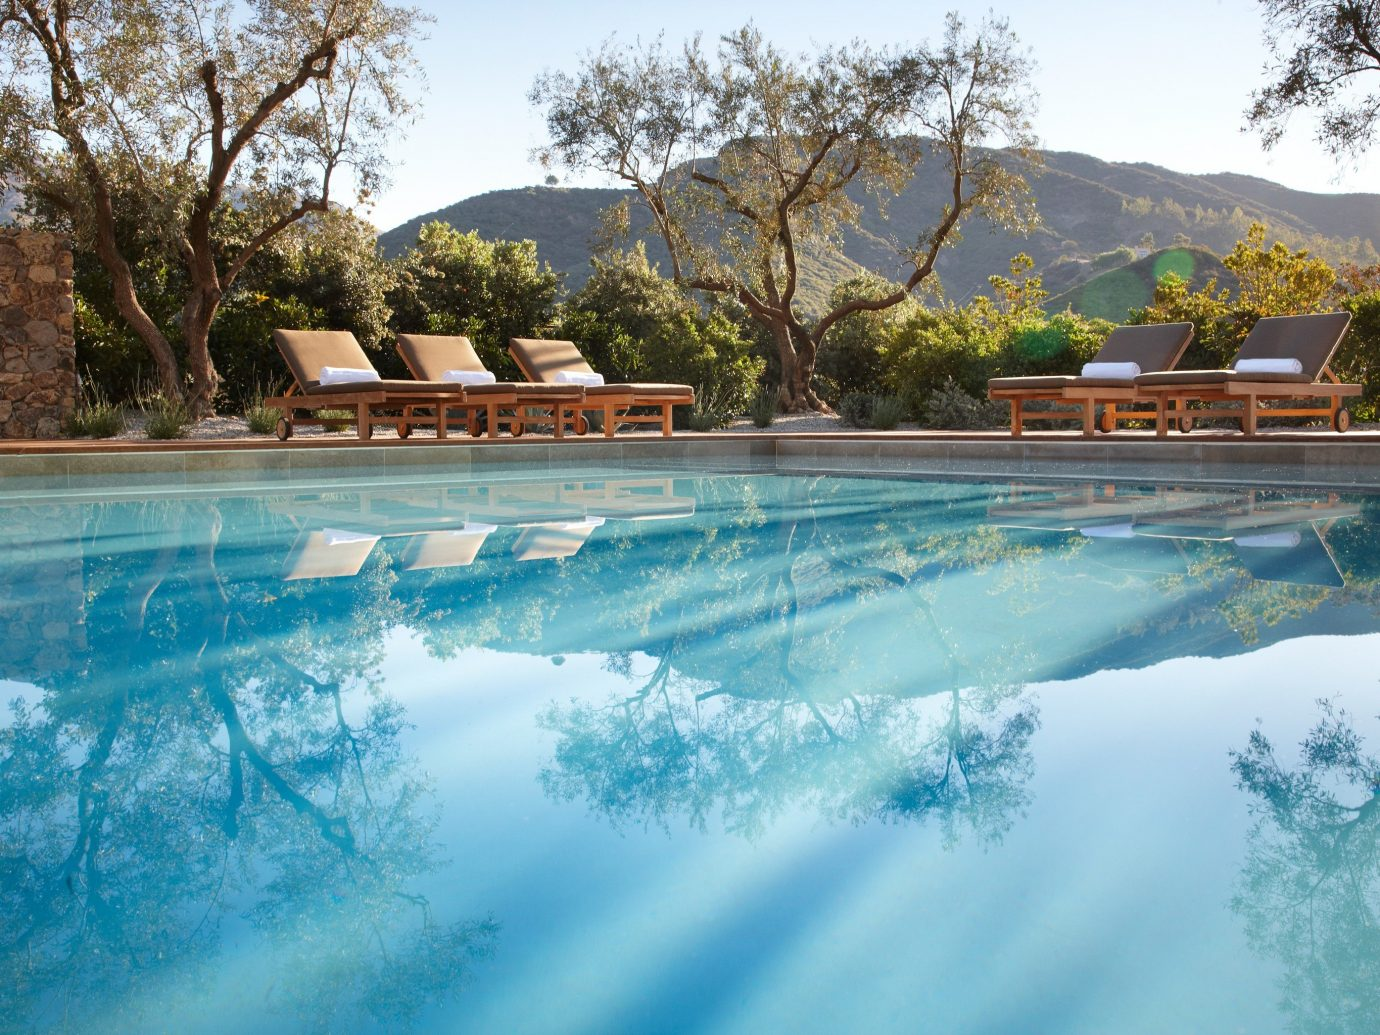 Hotels tree outdoor swimming pool property leisure estate vacation Resort backyard